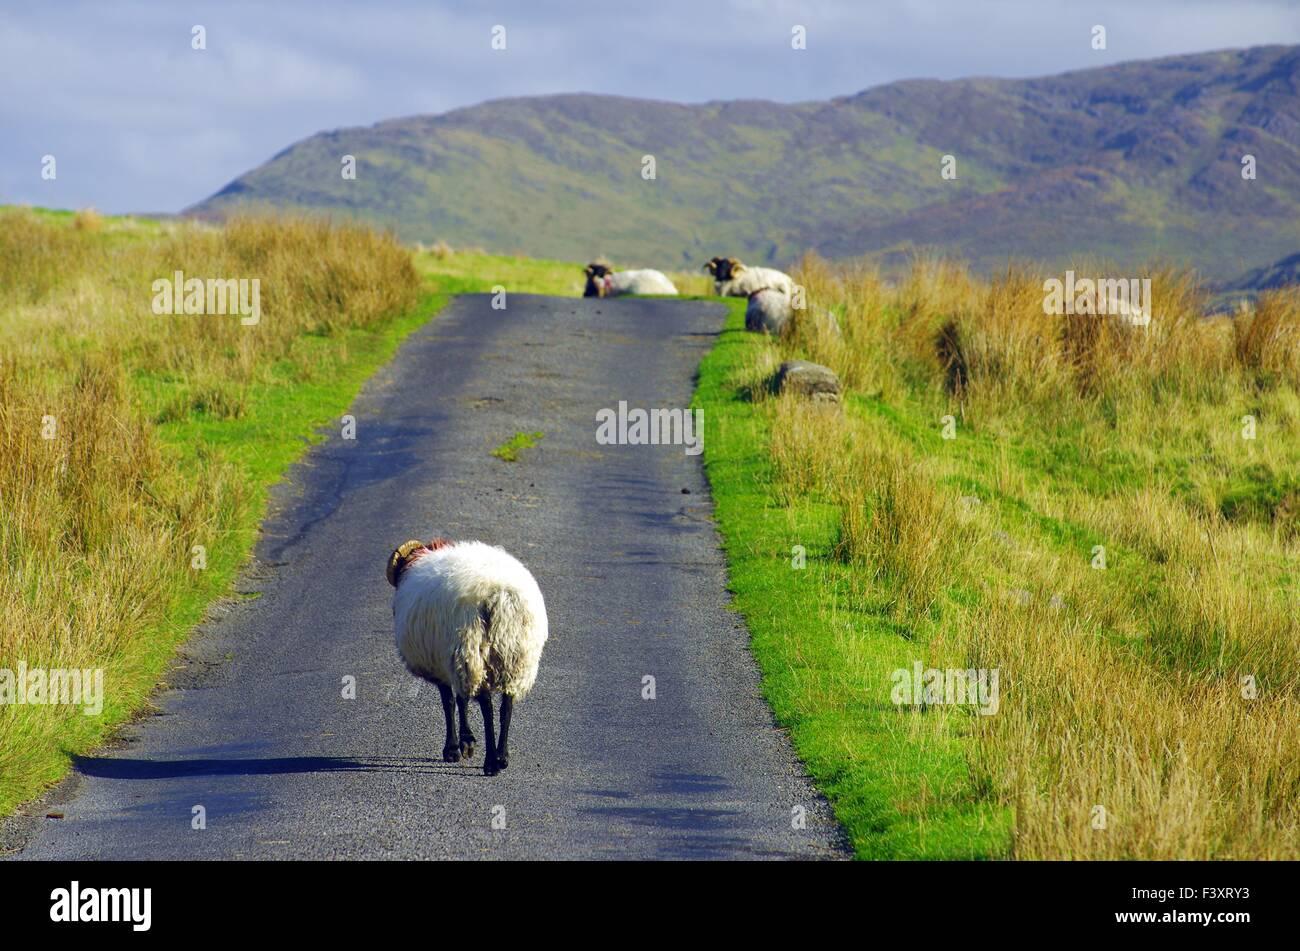 Rush hour in western ireland - Stock Image